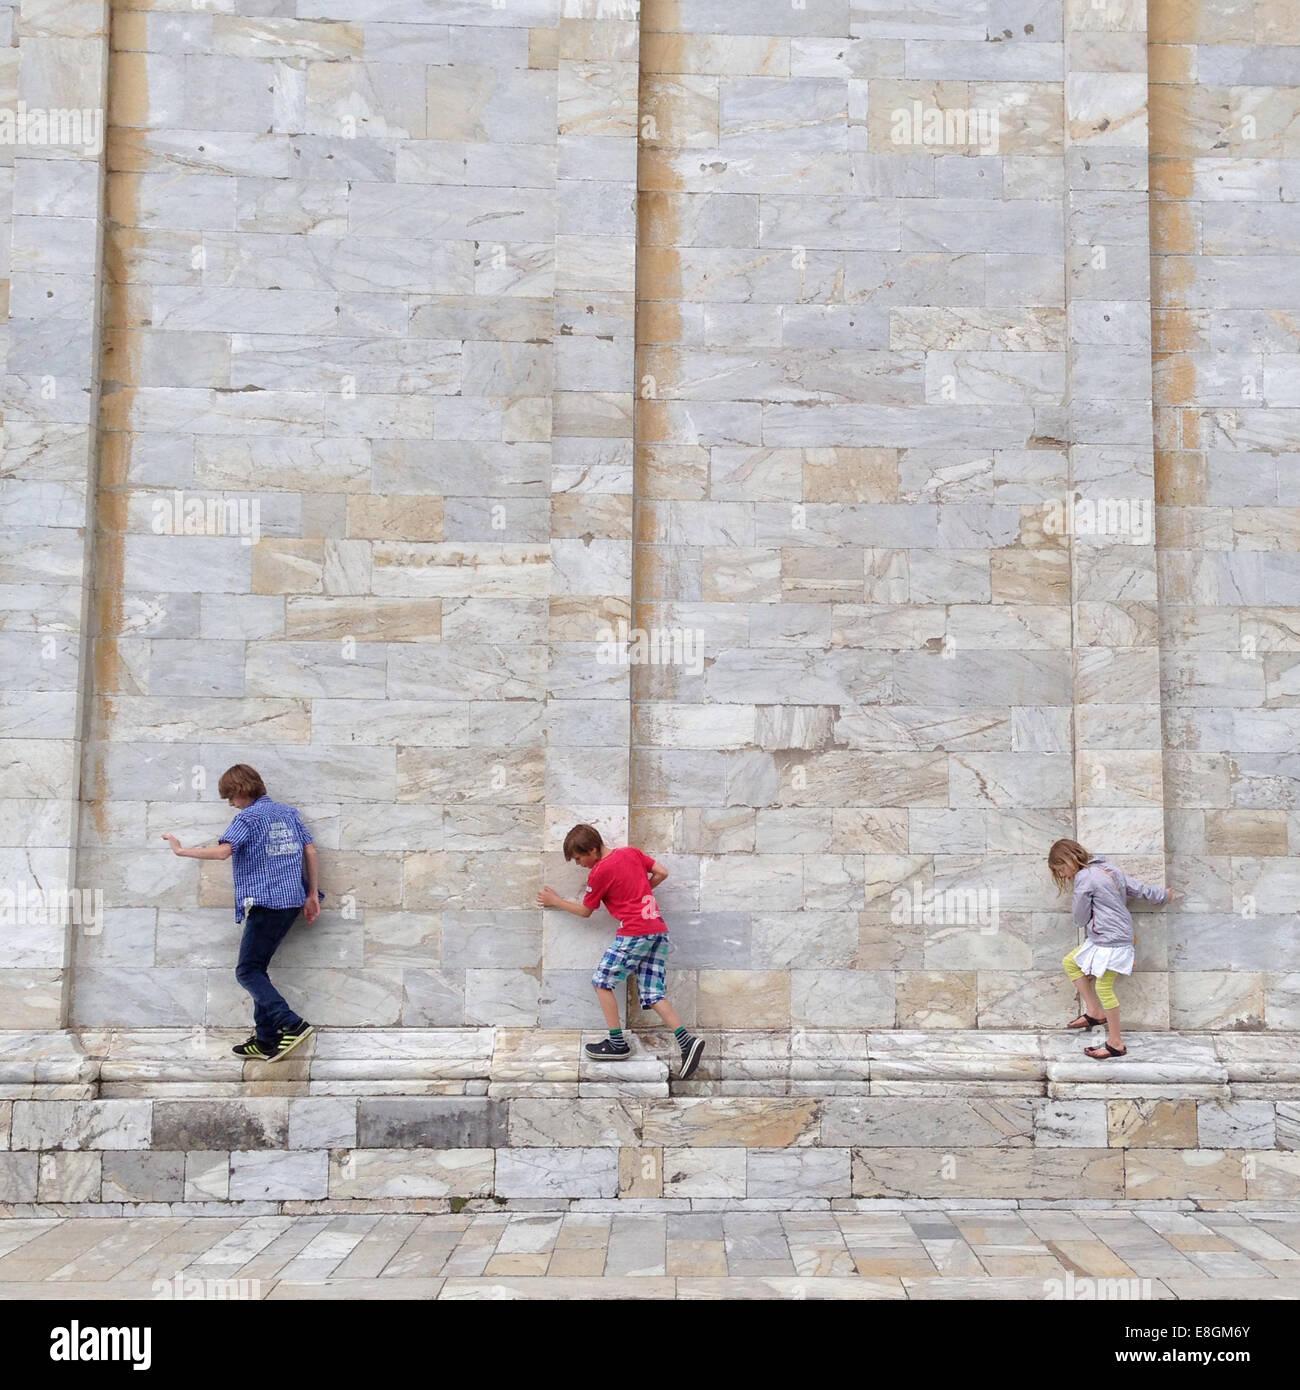 Italy, Tuscany, Pisa, Three adventurers (10-11, 12-13) - Stock Image